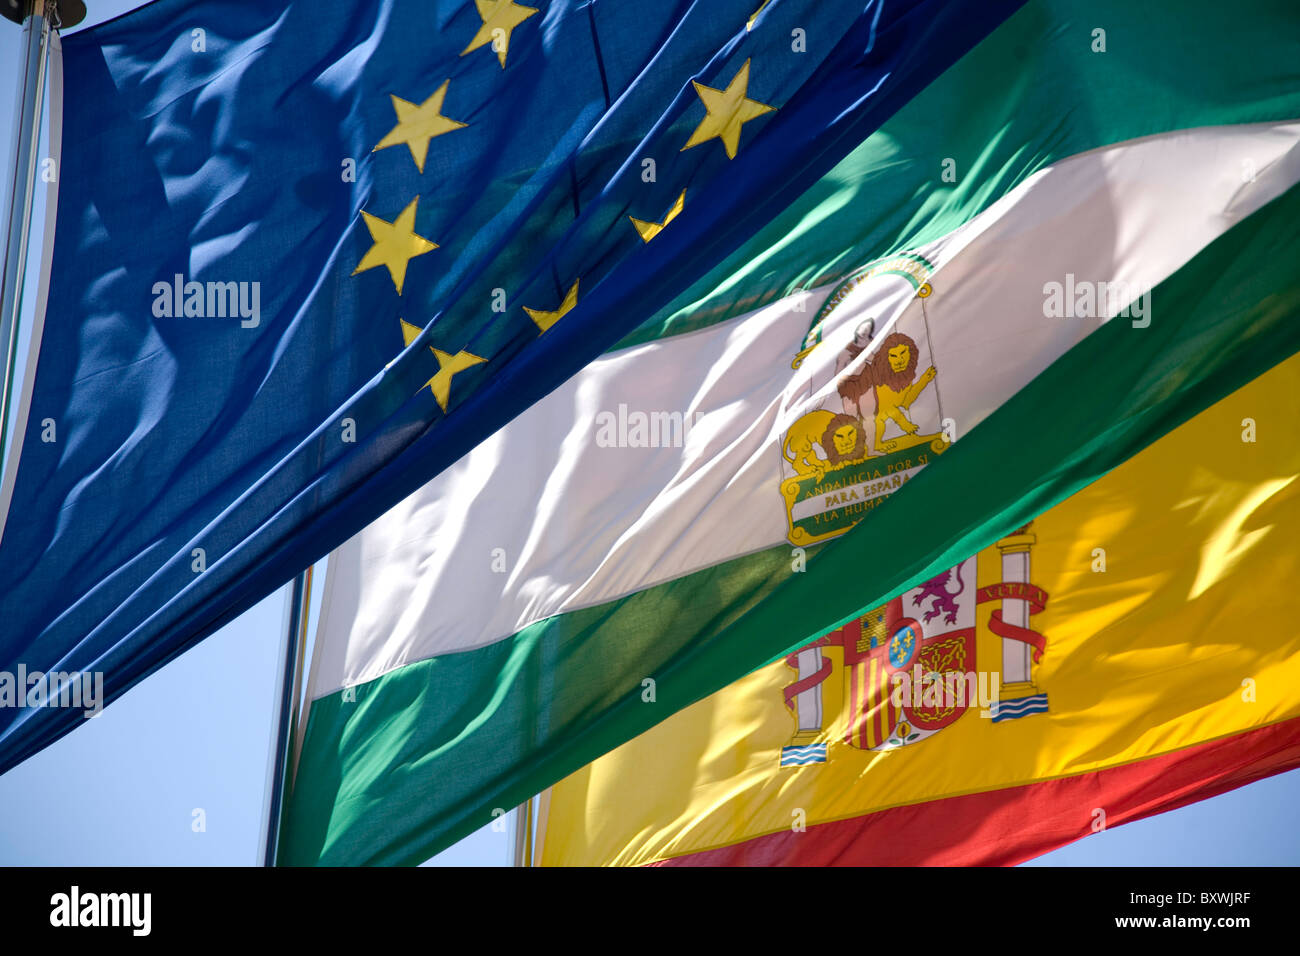 Flags in Granada, Spain. - Stock Image